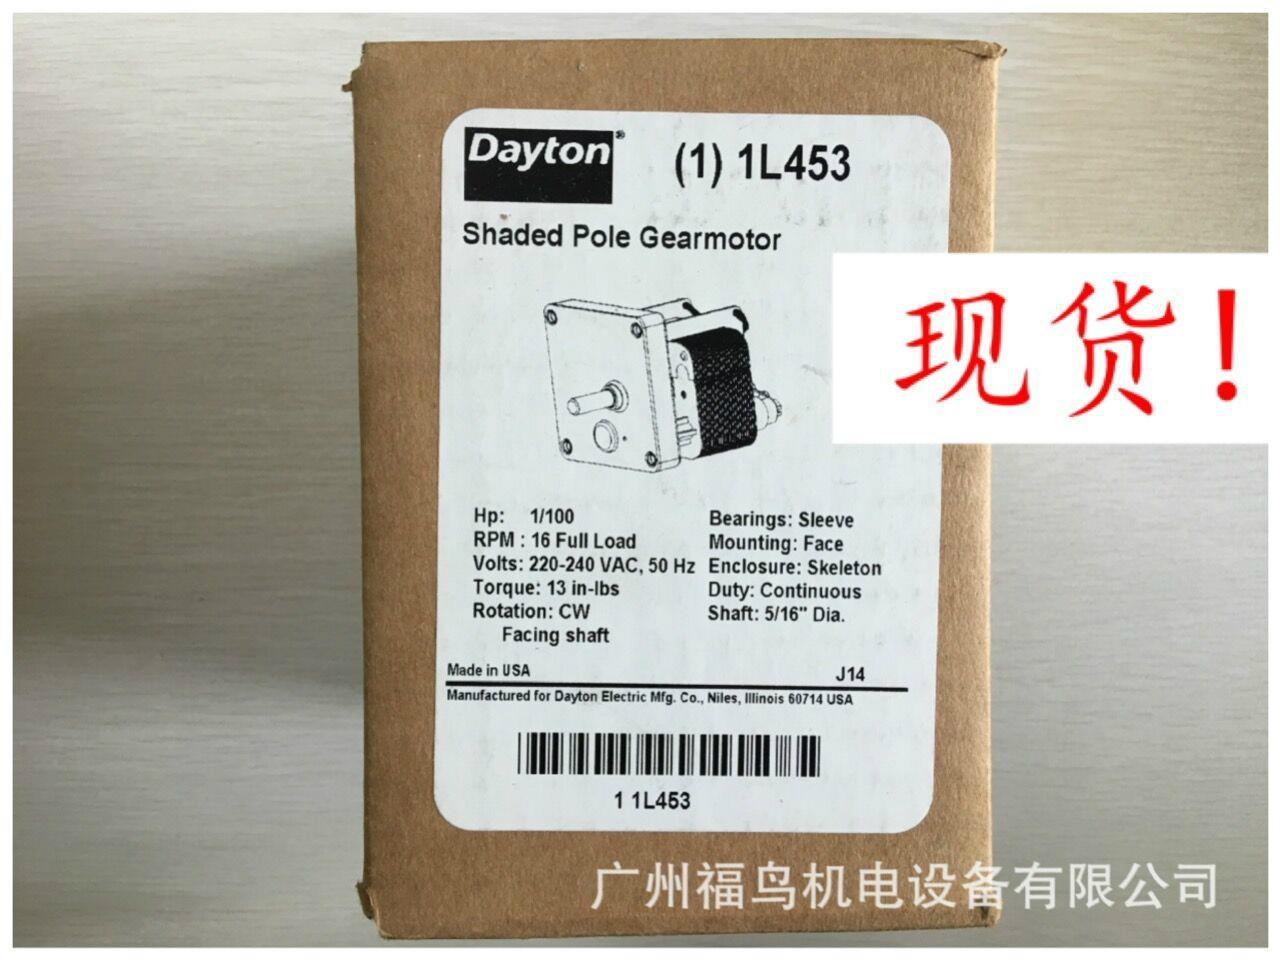 DAYTON電機, 馬達, 現貨型號: 1L453